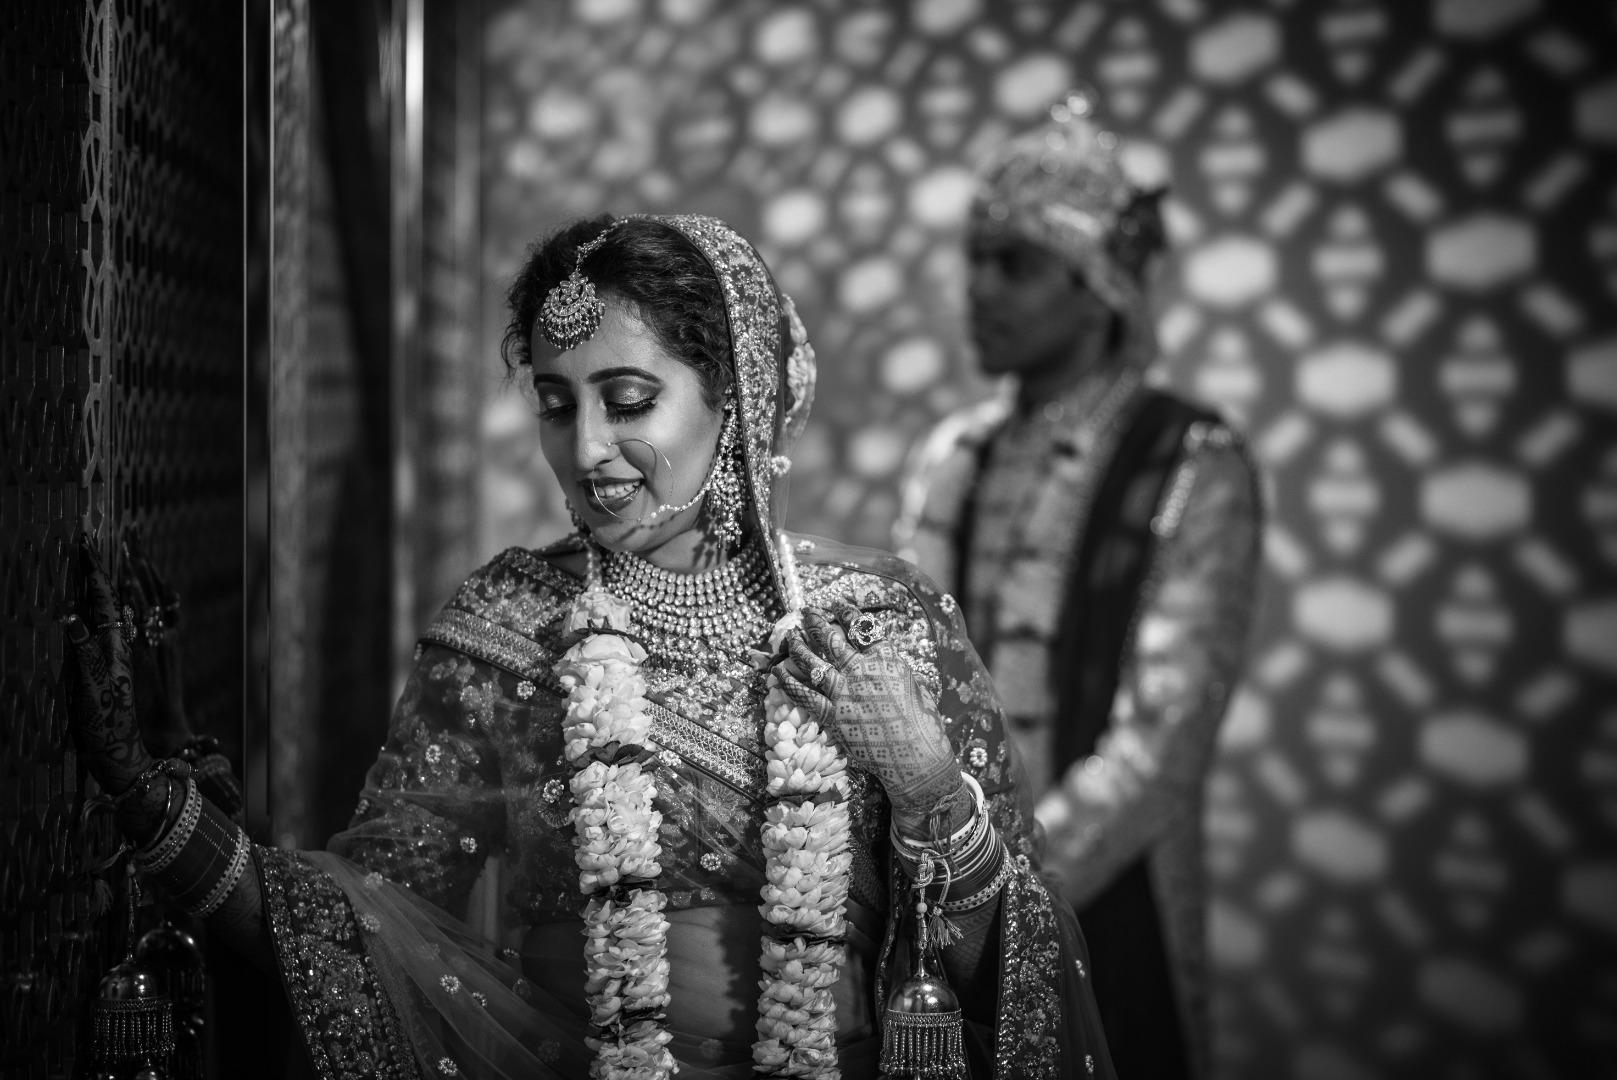 Black and white happy wedding photos